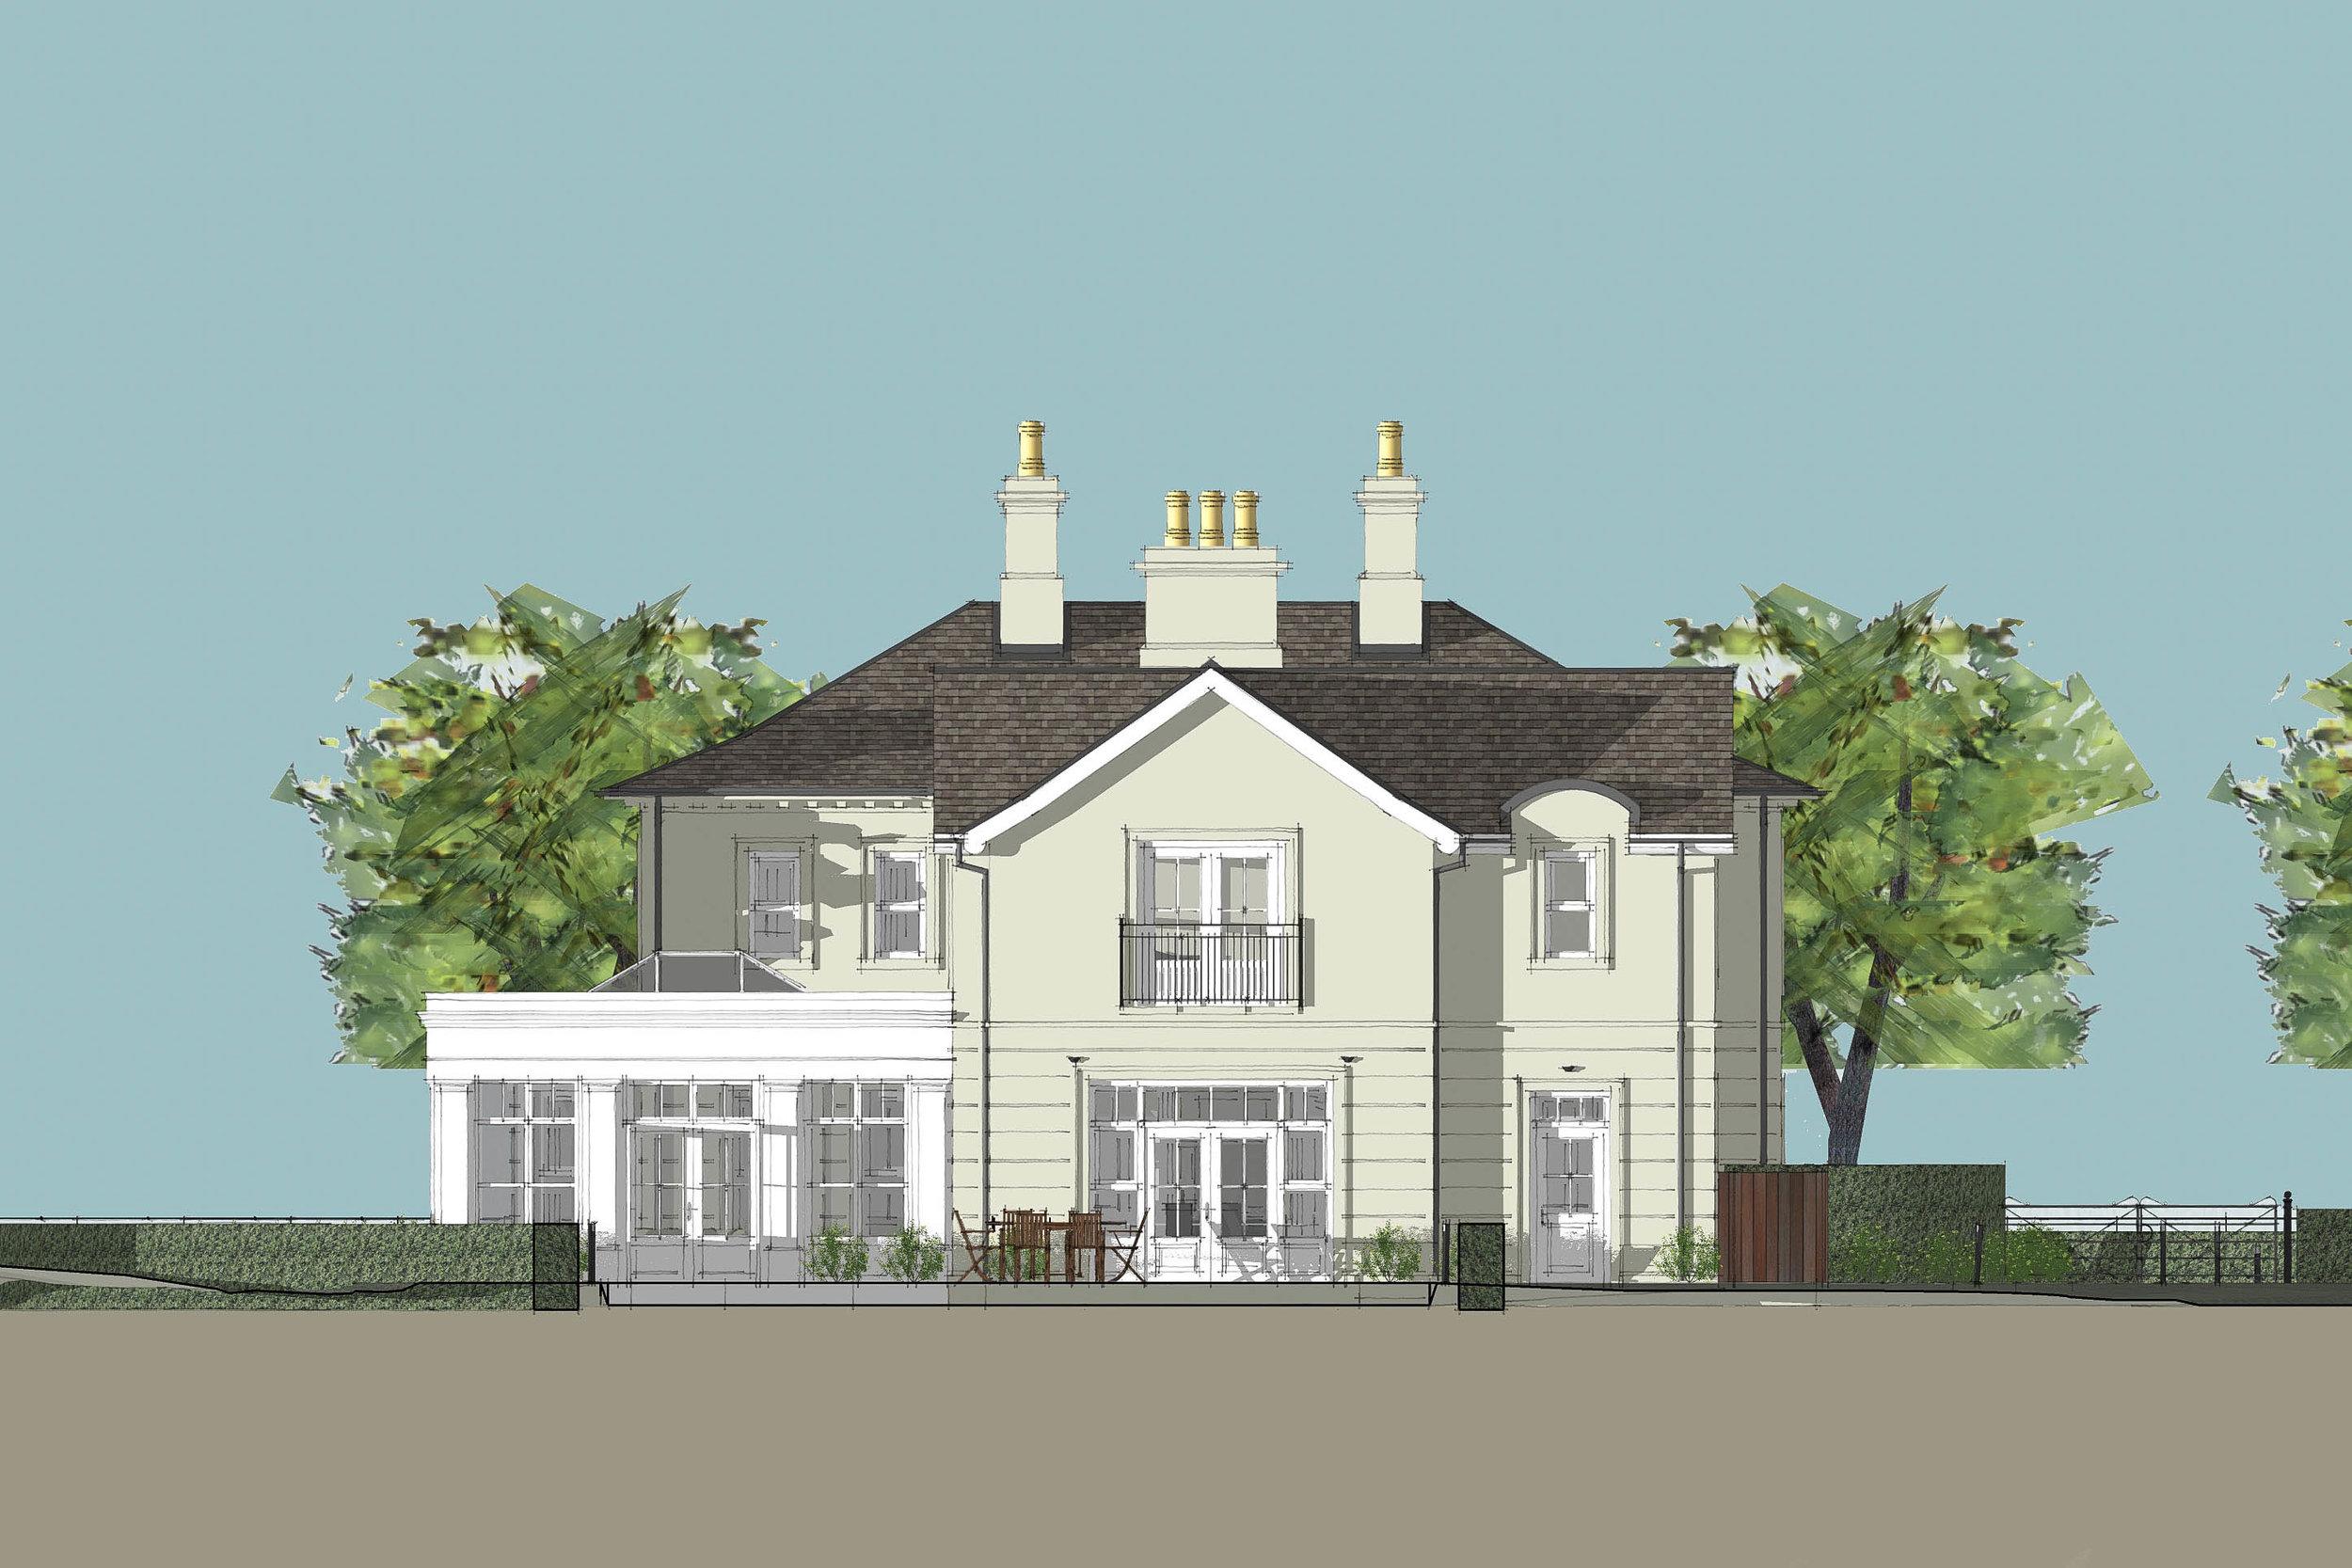 Paul_McAlister_Architects_Rear elevation.jpg